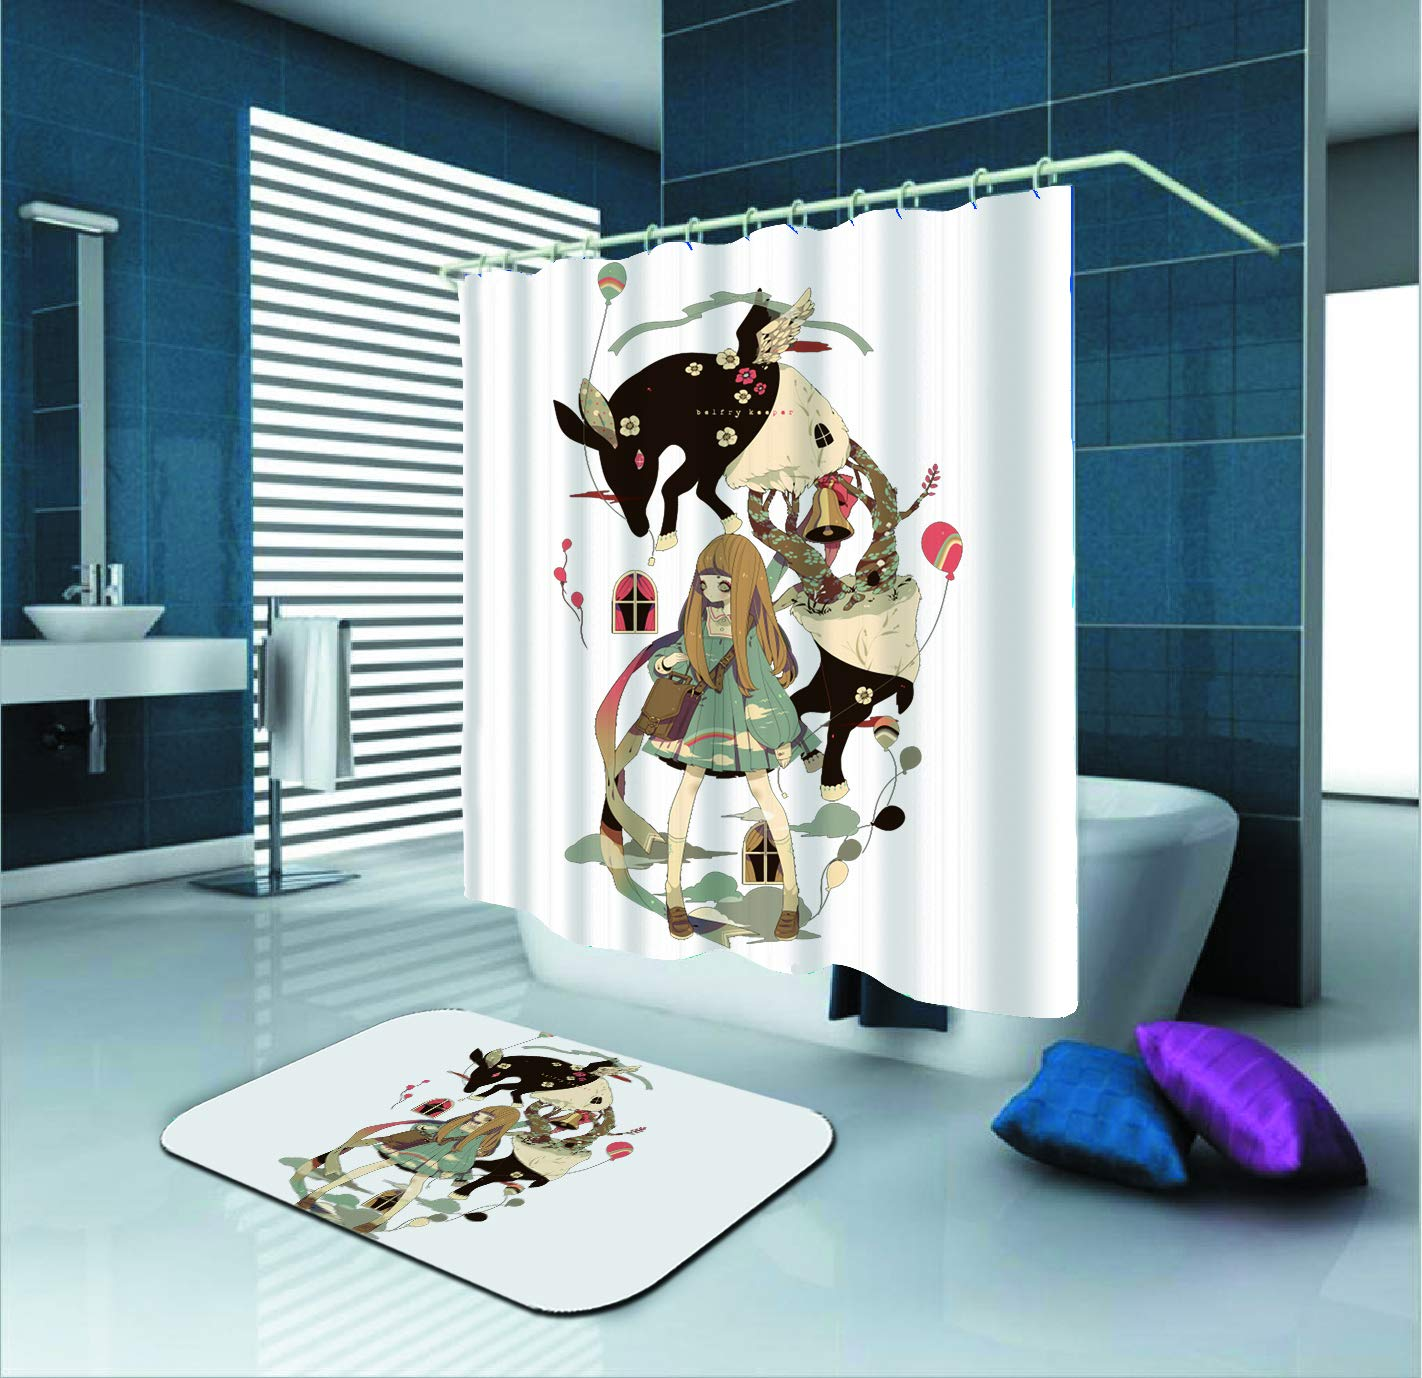 SARA NELL Shower Curtain Goth Gotik Gothic Women Girl Animal Waterproof Polyester Fabric Shower Curtain (72'' X 72'') Set 12 Hooks Bath Mats Rugs (23.6'' X 15.7'') Bathroom-Set Of 2